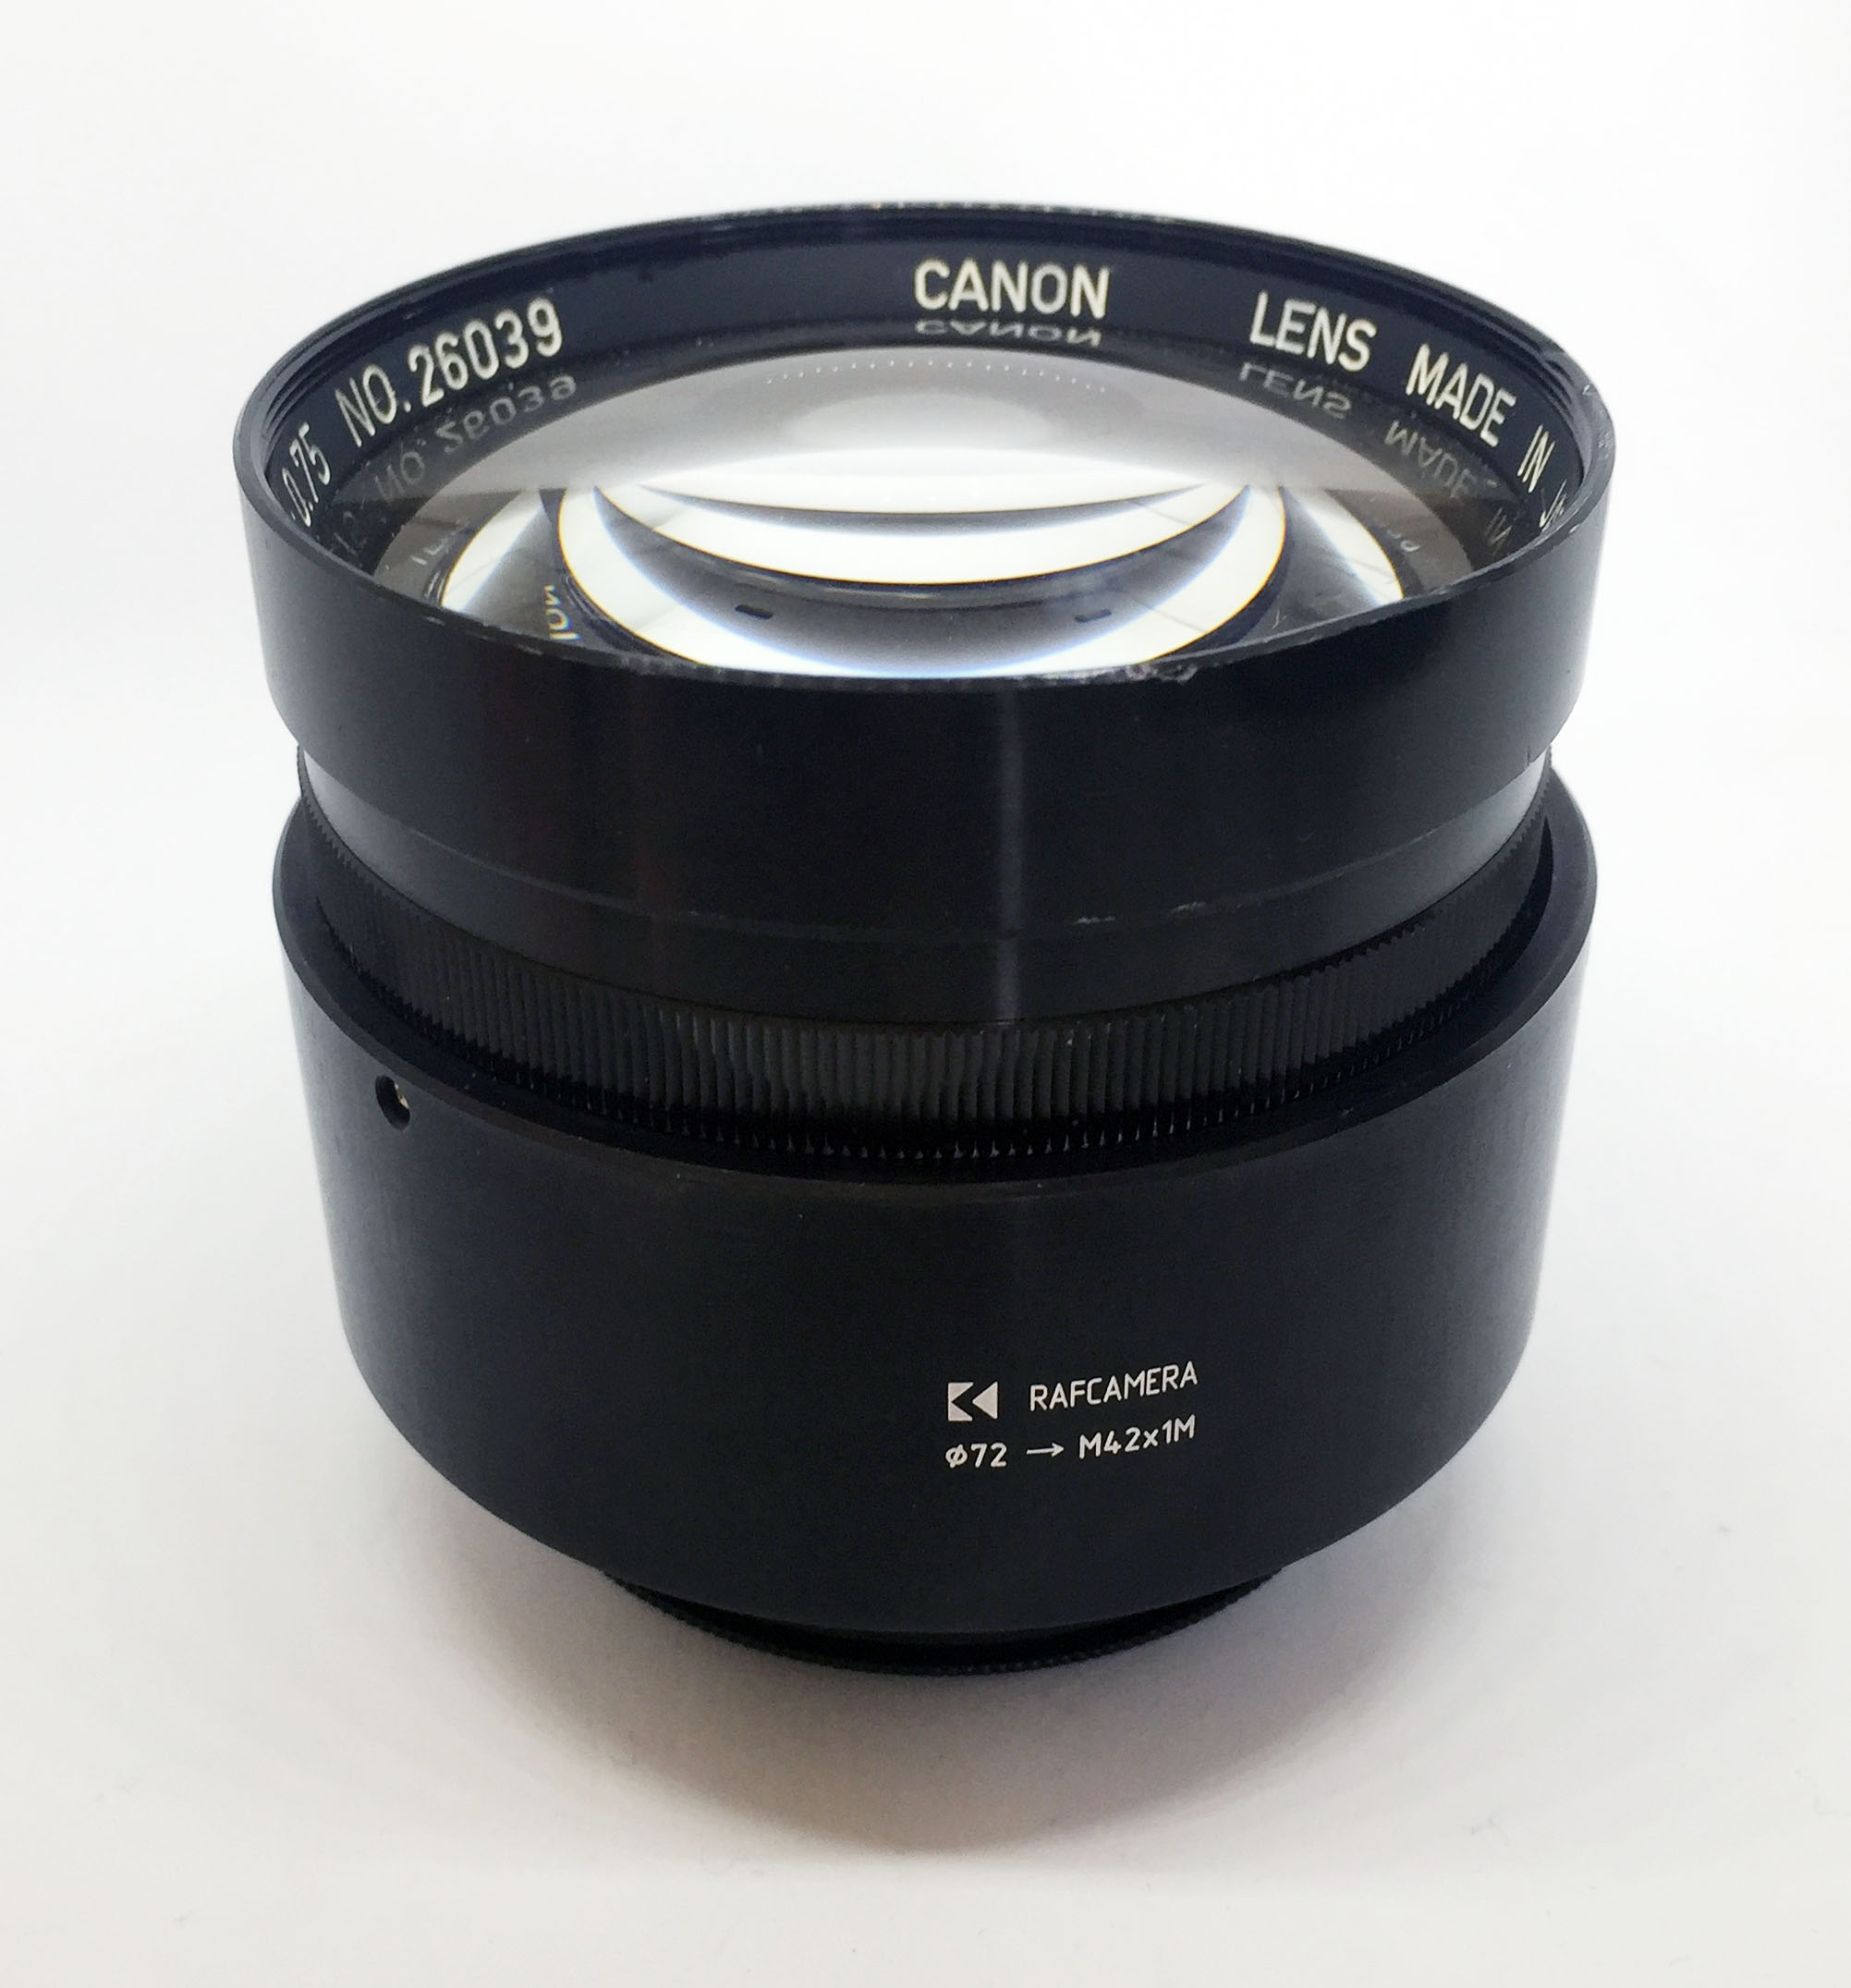 Canon 50mm f0.75 XI lens mount